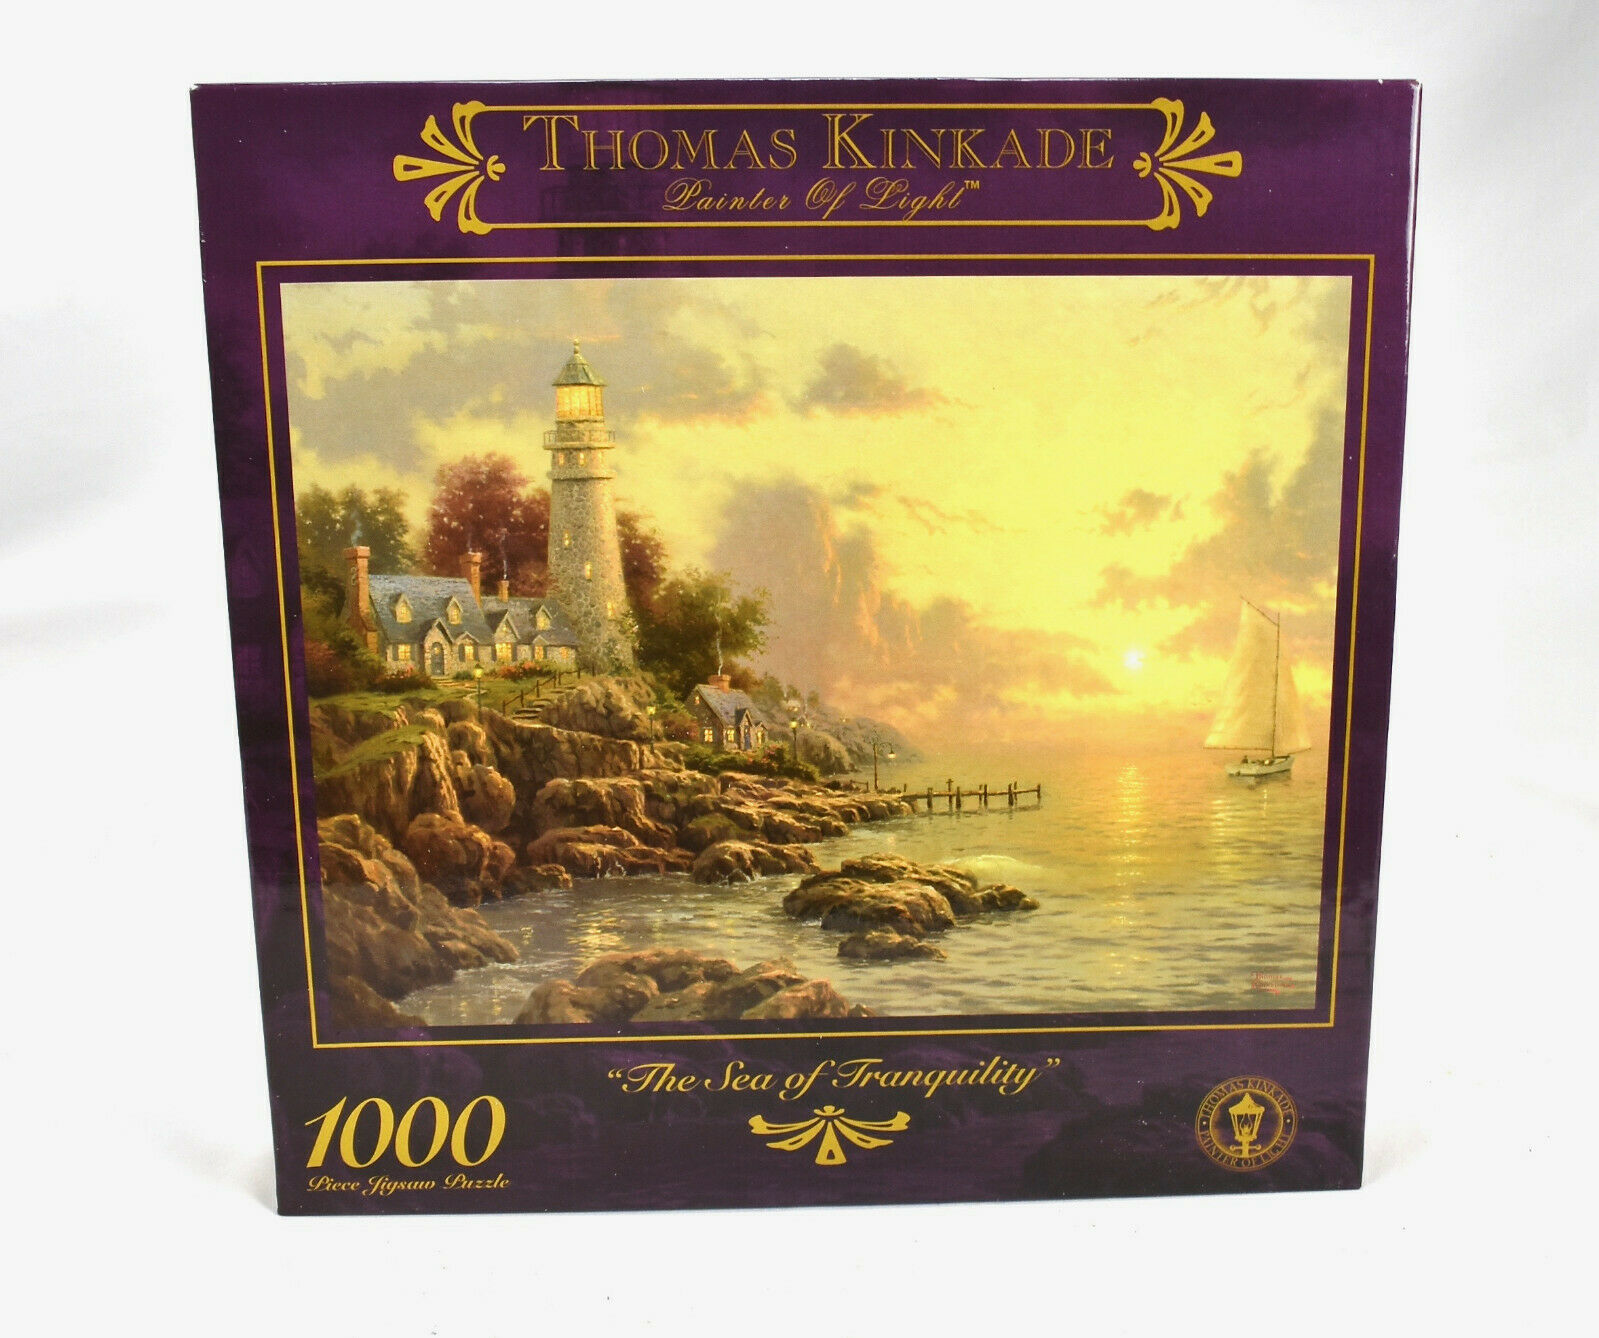 Vtg Thomas Kinkade Sea of Tranquility Jigsaw Puzzle A Quite Evening 1000 pc  - $29.65